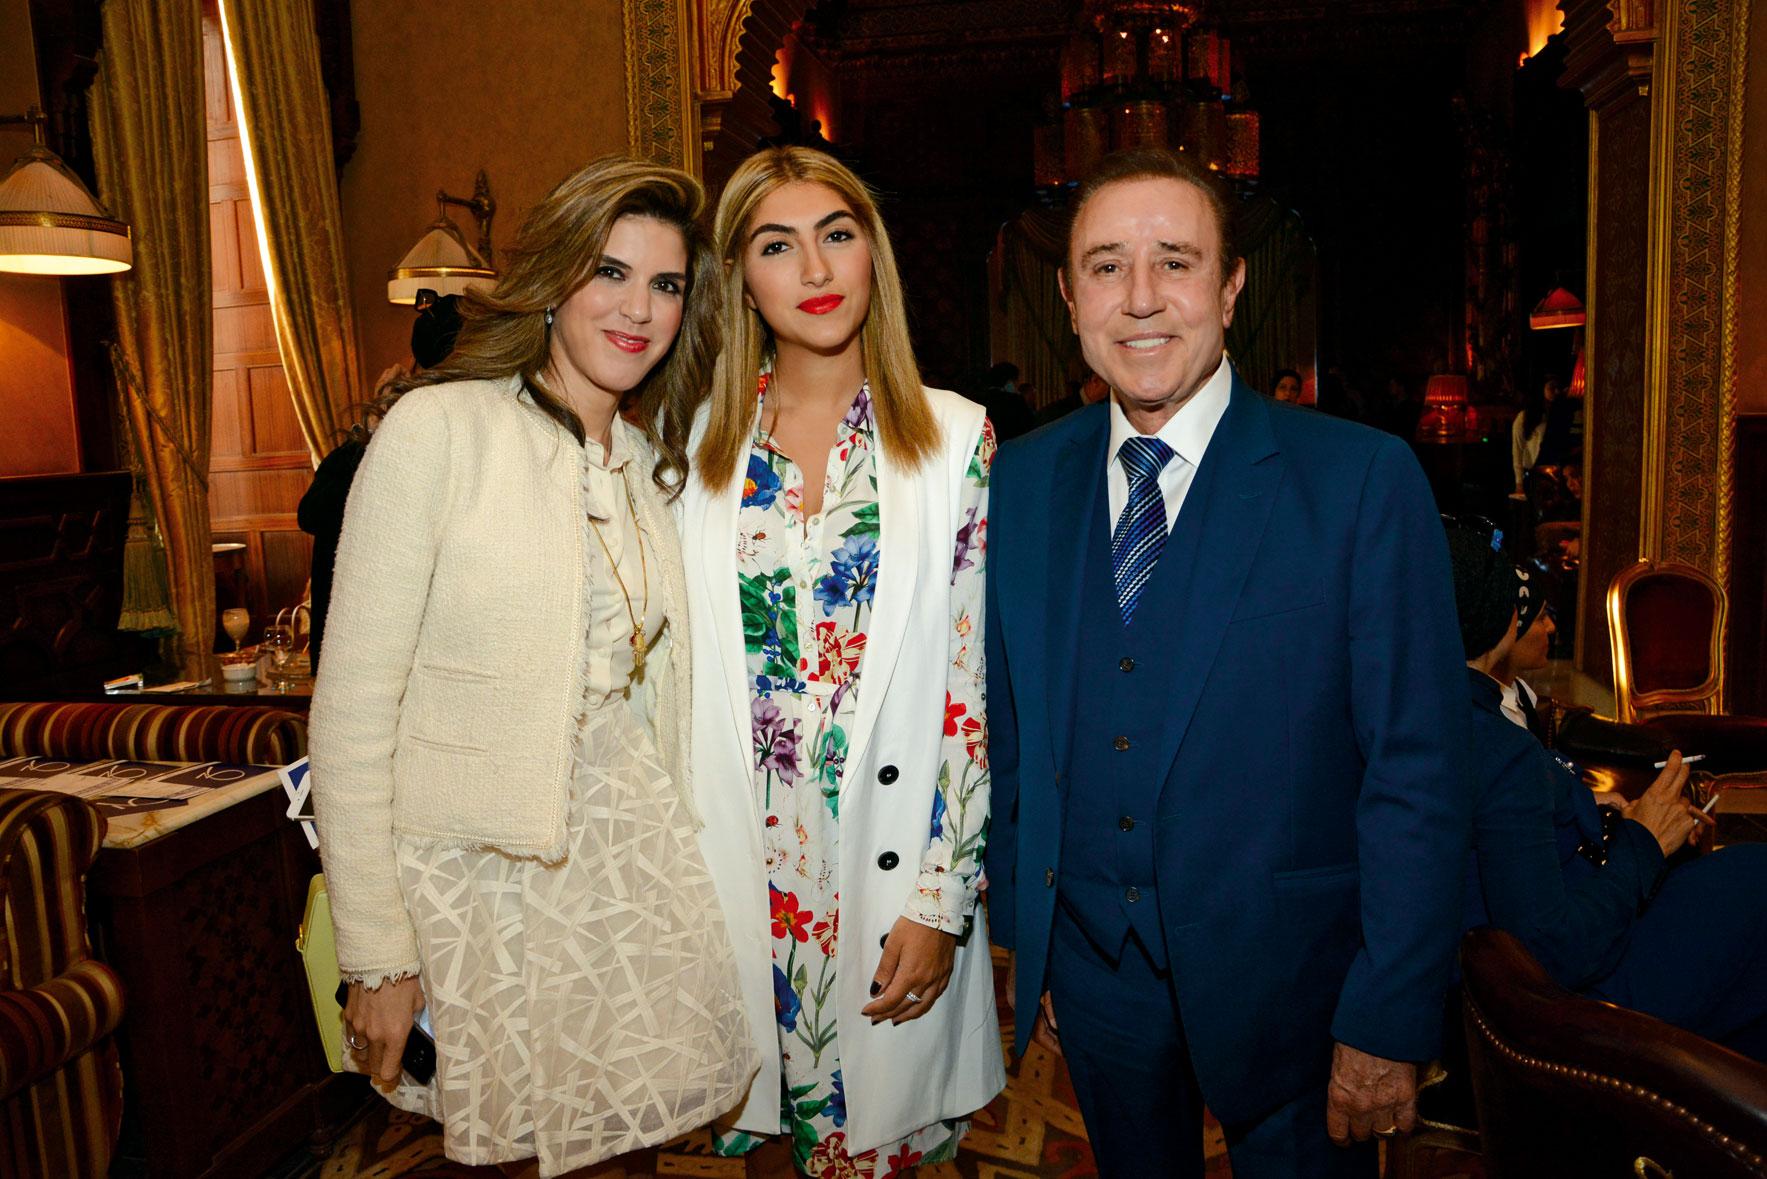 Ms. Yasmine Shihata,  Ms. Heba Serag El Din & Dr. Zein Obagi